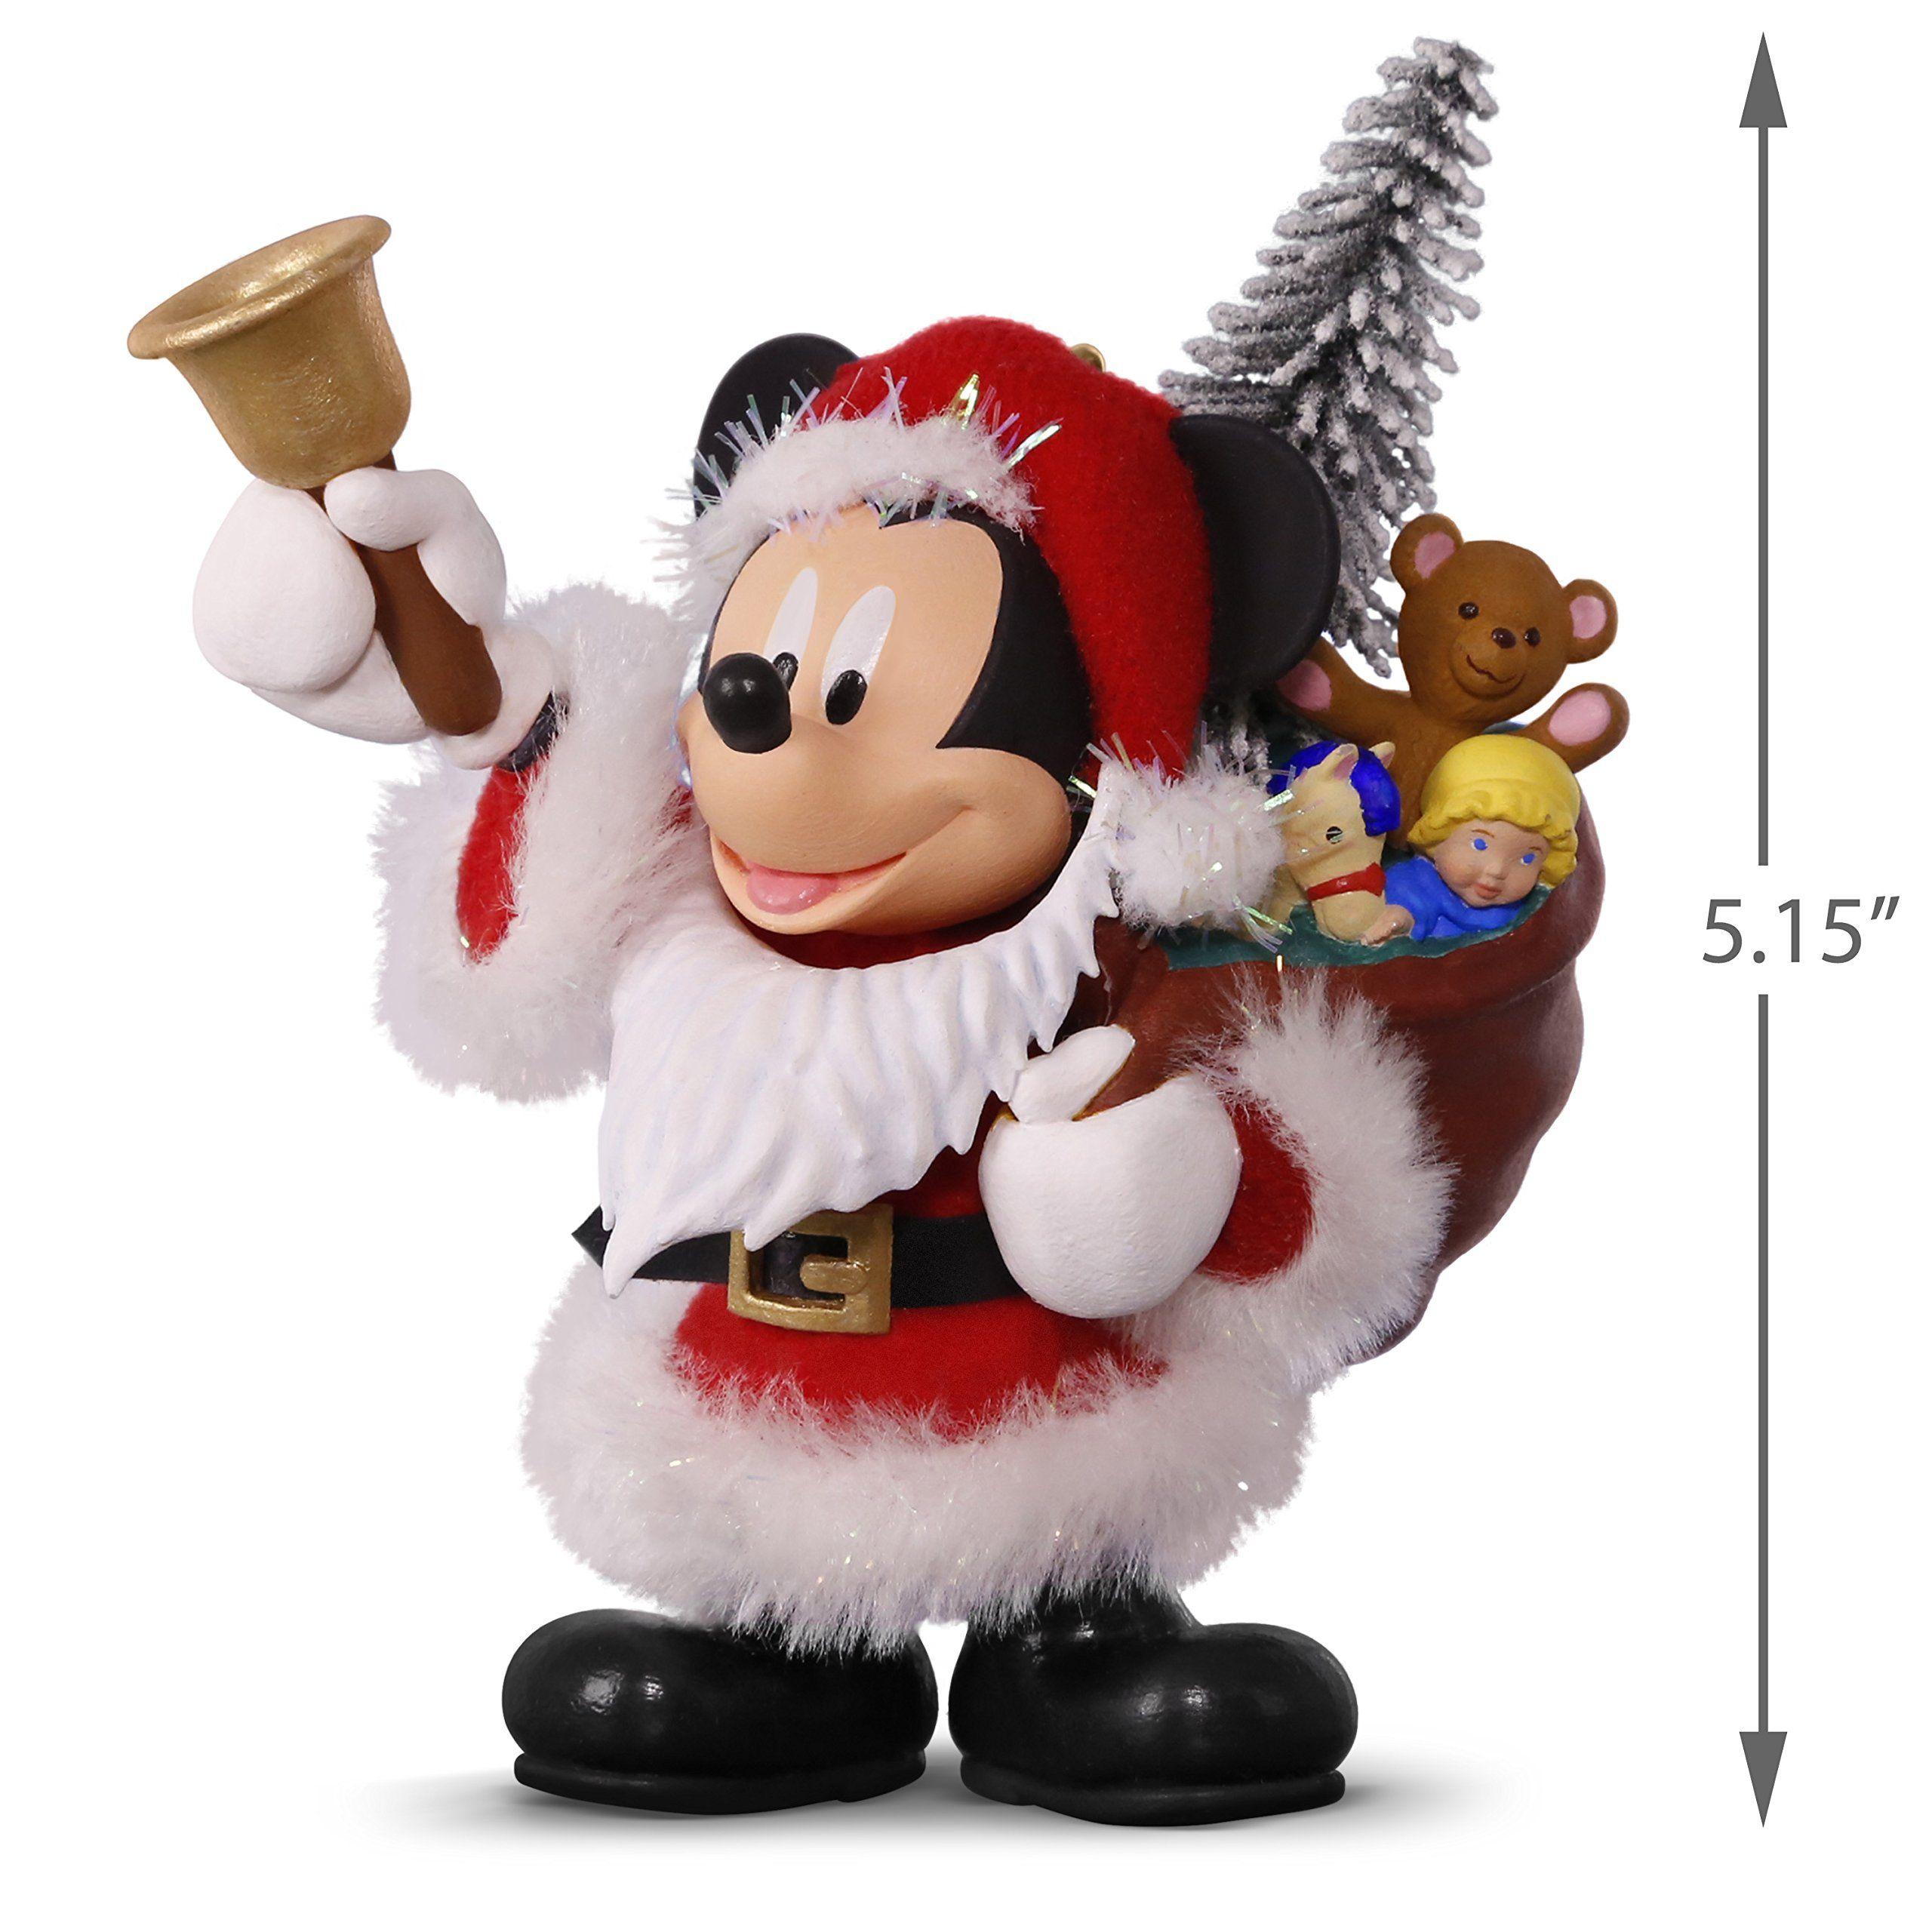 Hallmark Keepsake 2017 Disney Mickey Mouse Here Comes